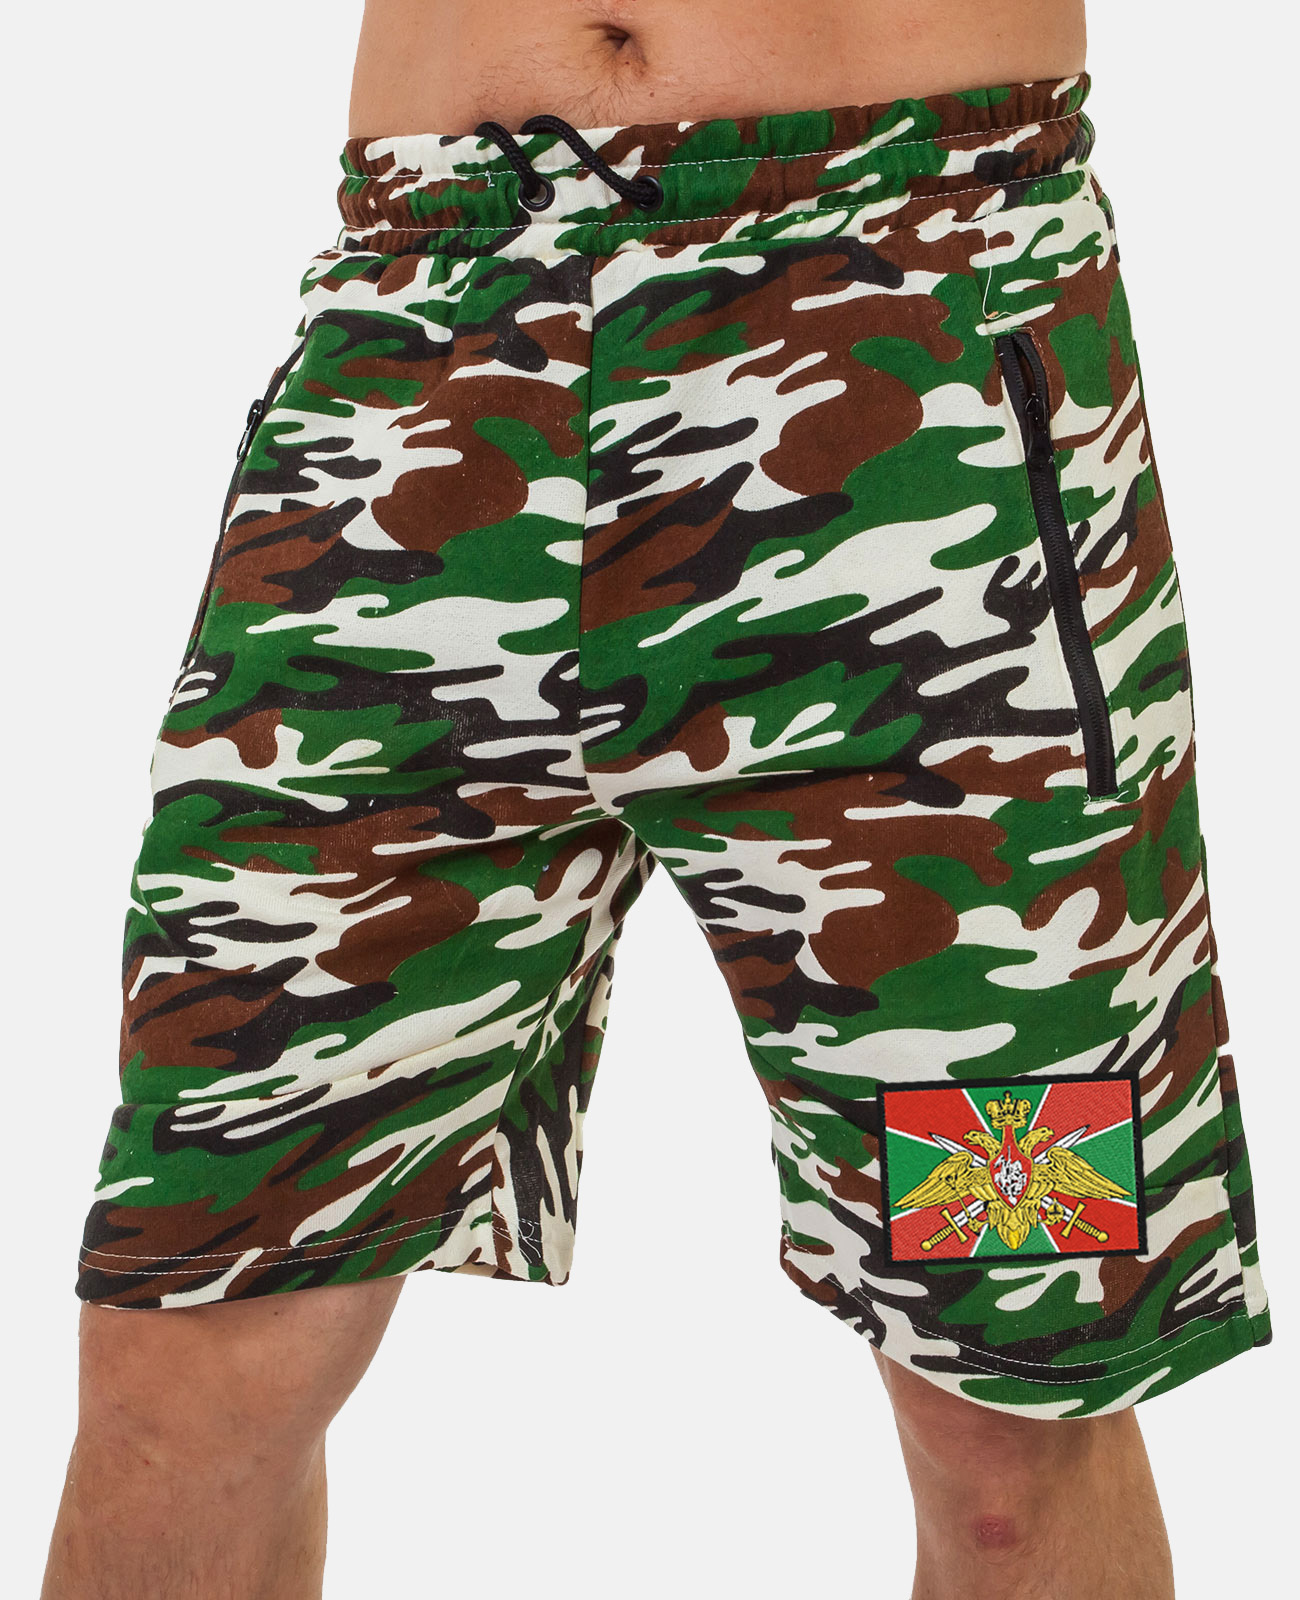 Армейские шорты, камуфляж недорого онлайн